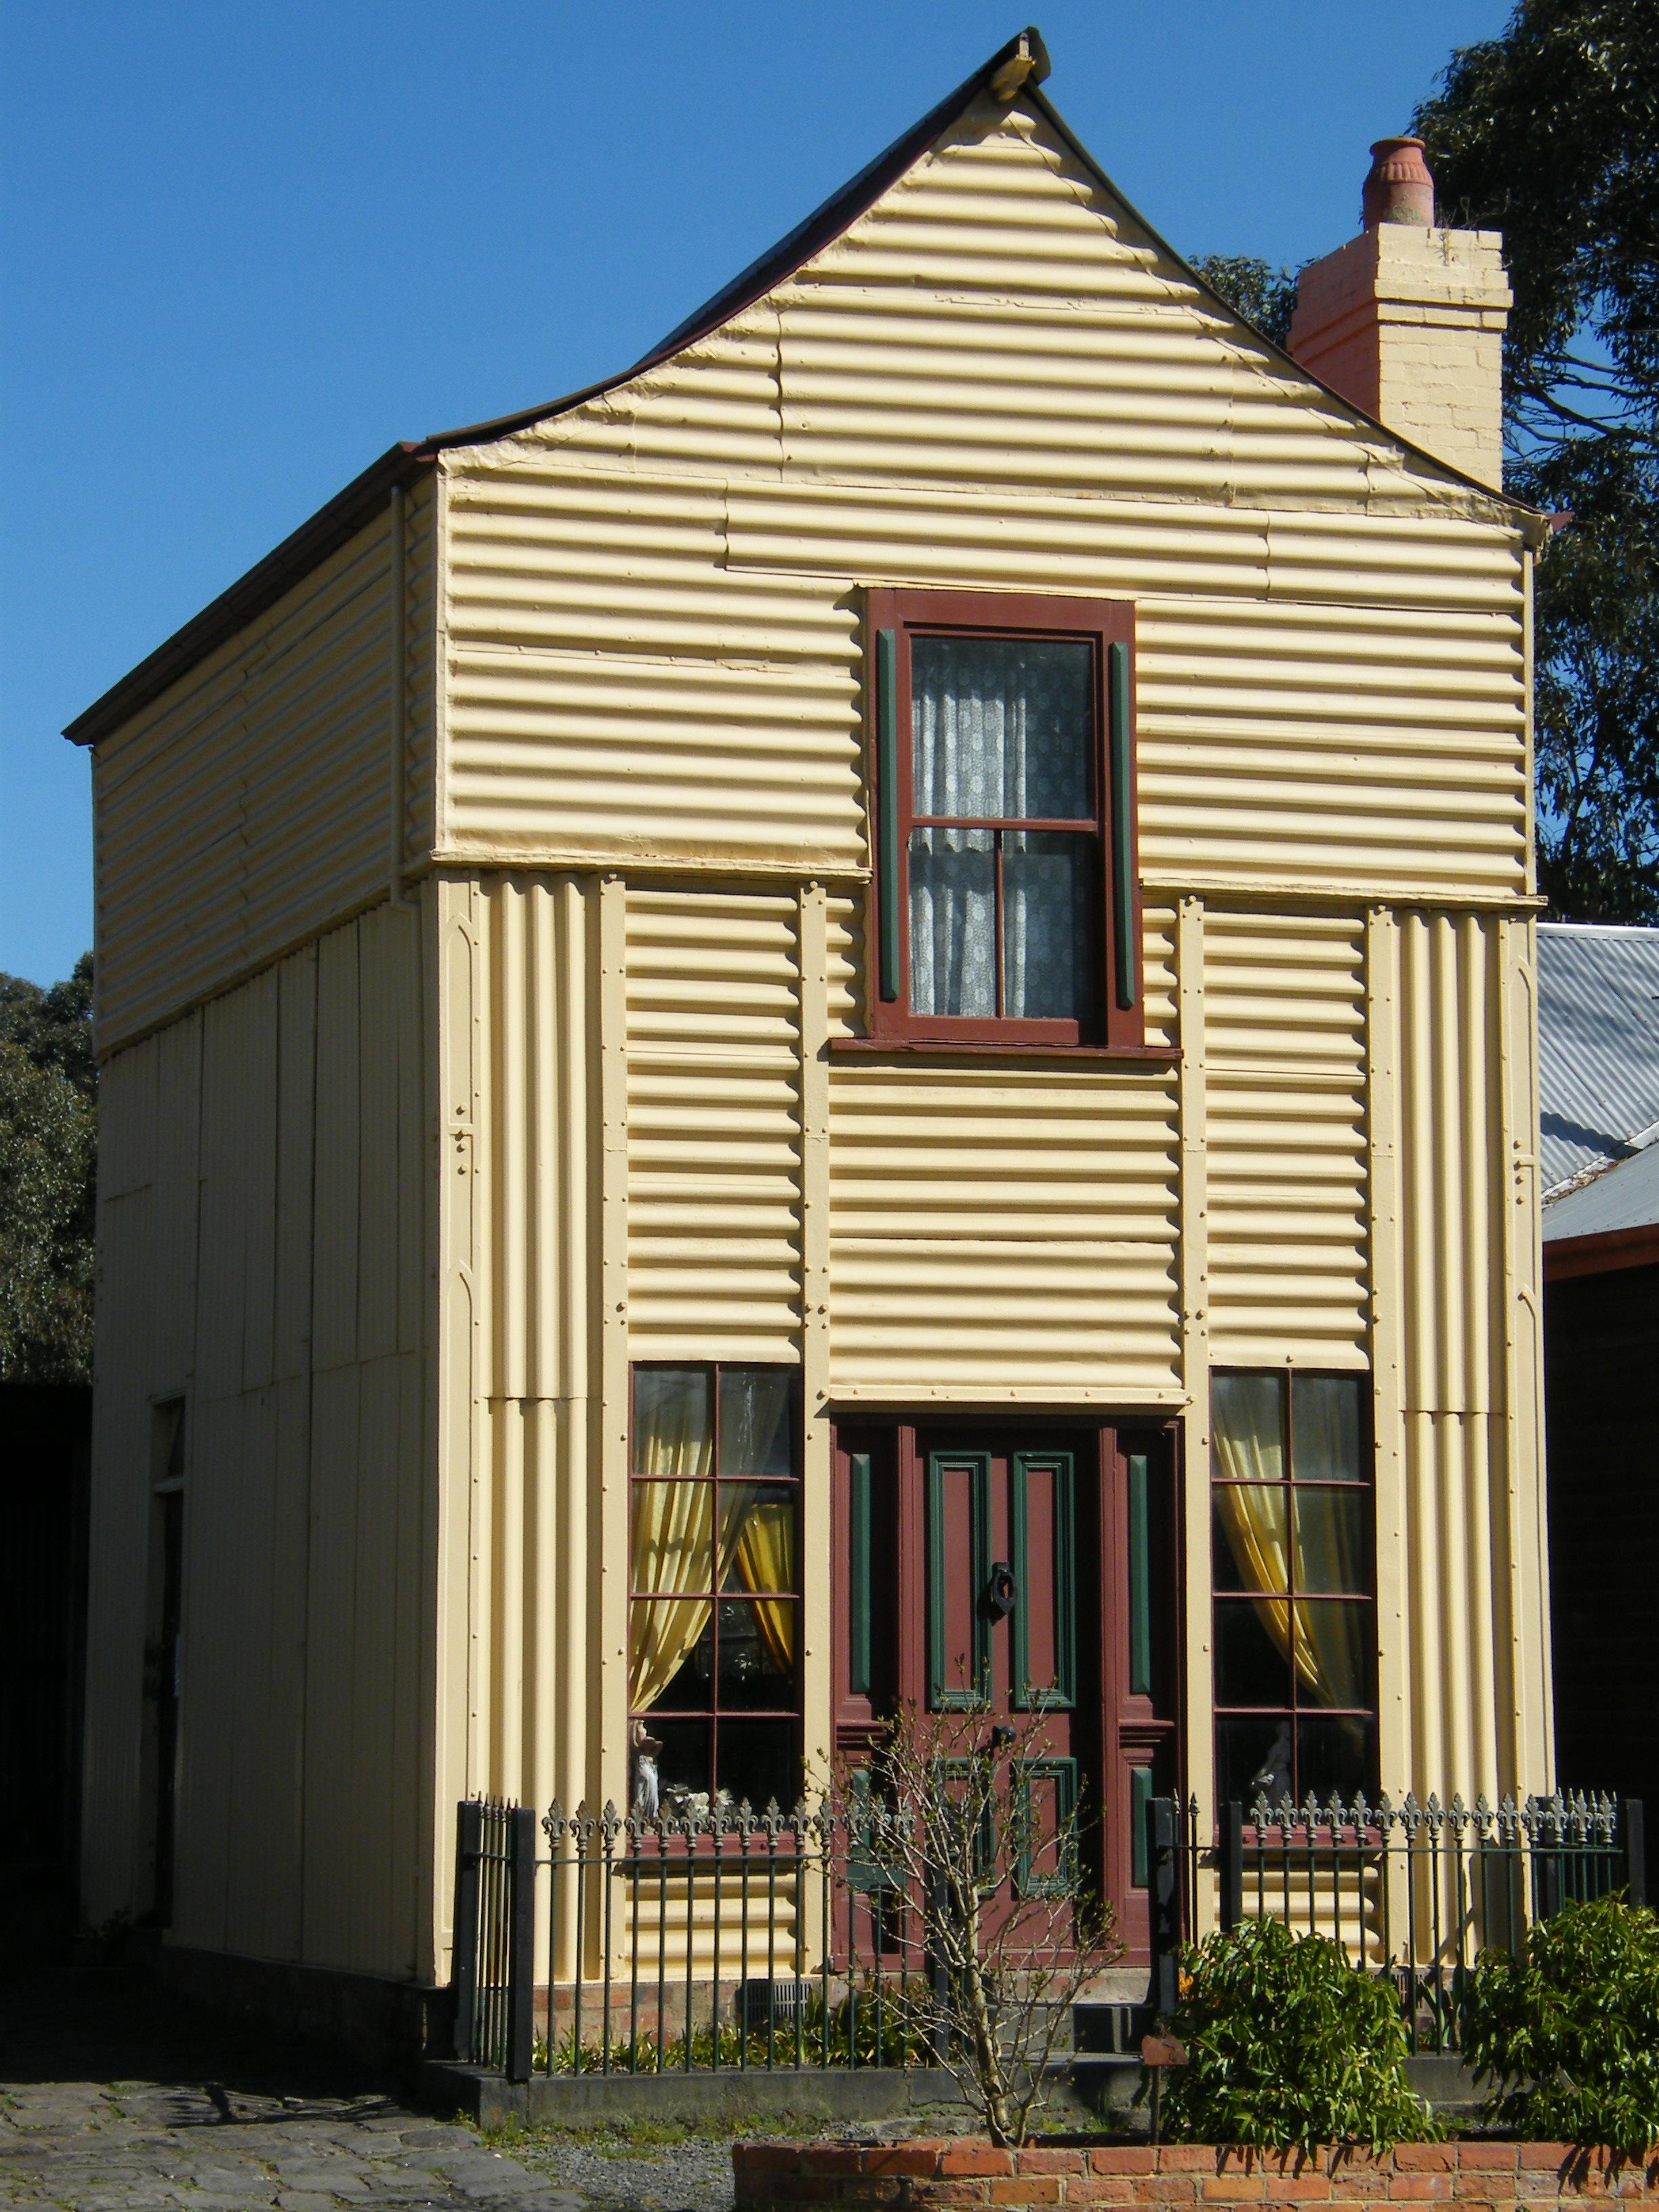 File loren iron house old gippstown jpg wikimedia commons for Modular home designs australia